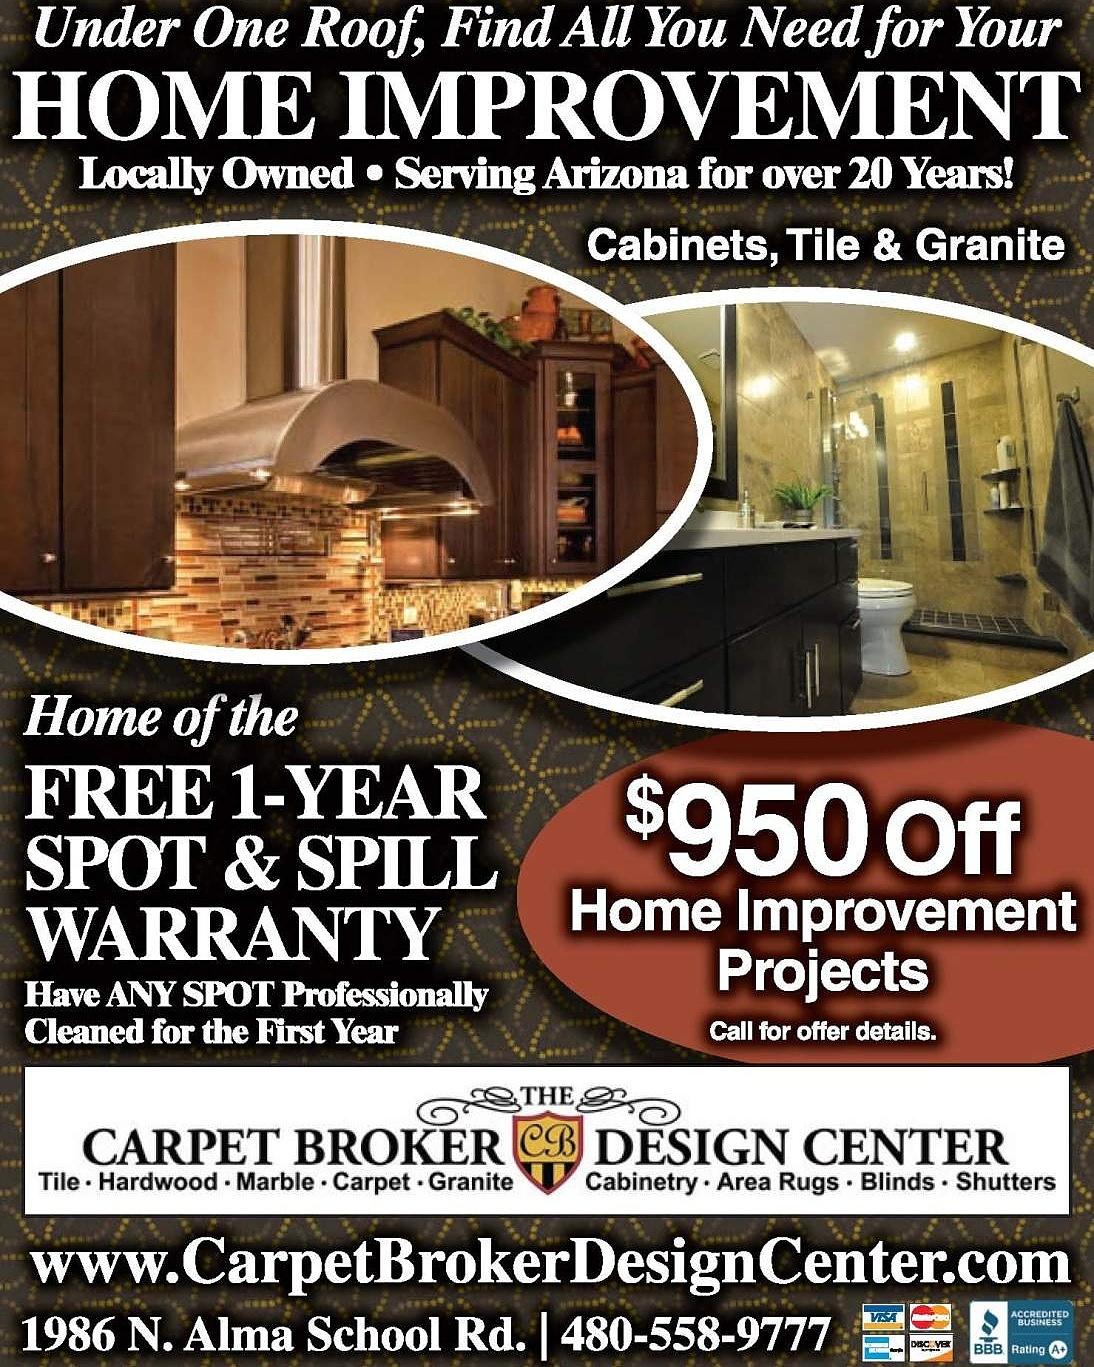 the carpet broker design center cabinets tile granite hardwood